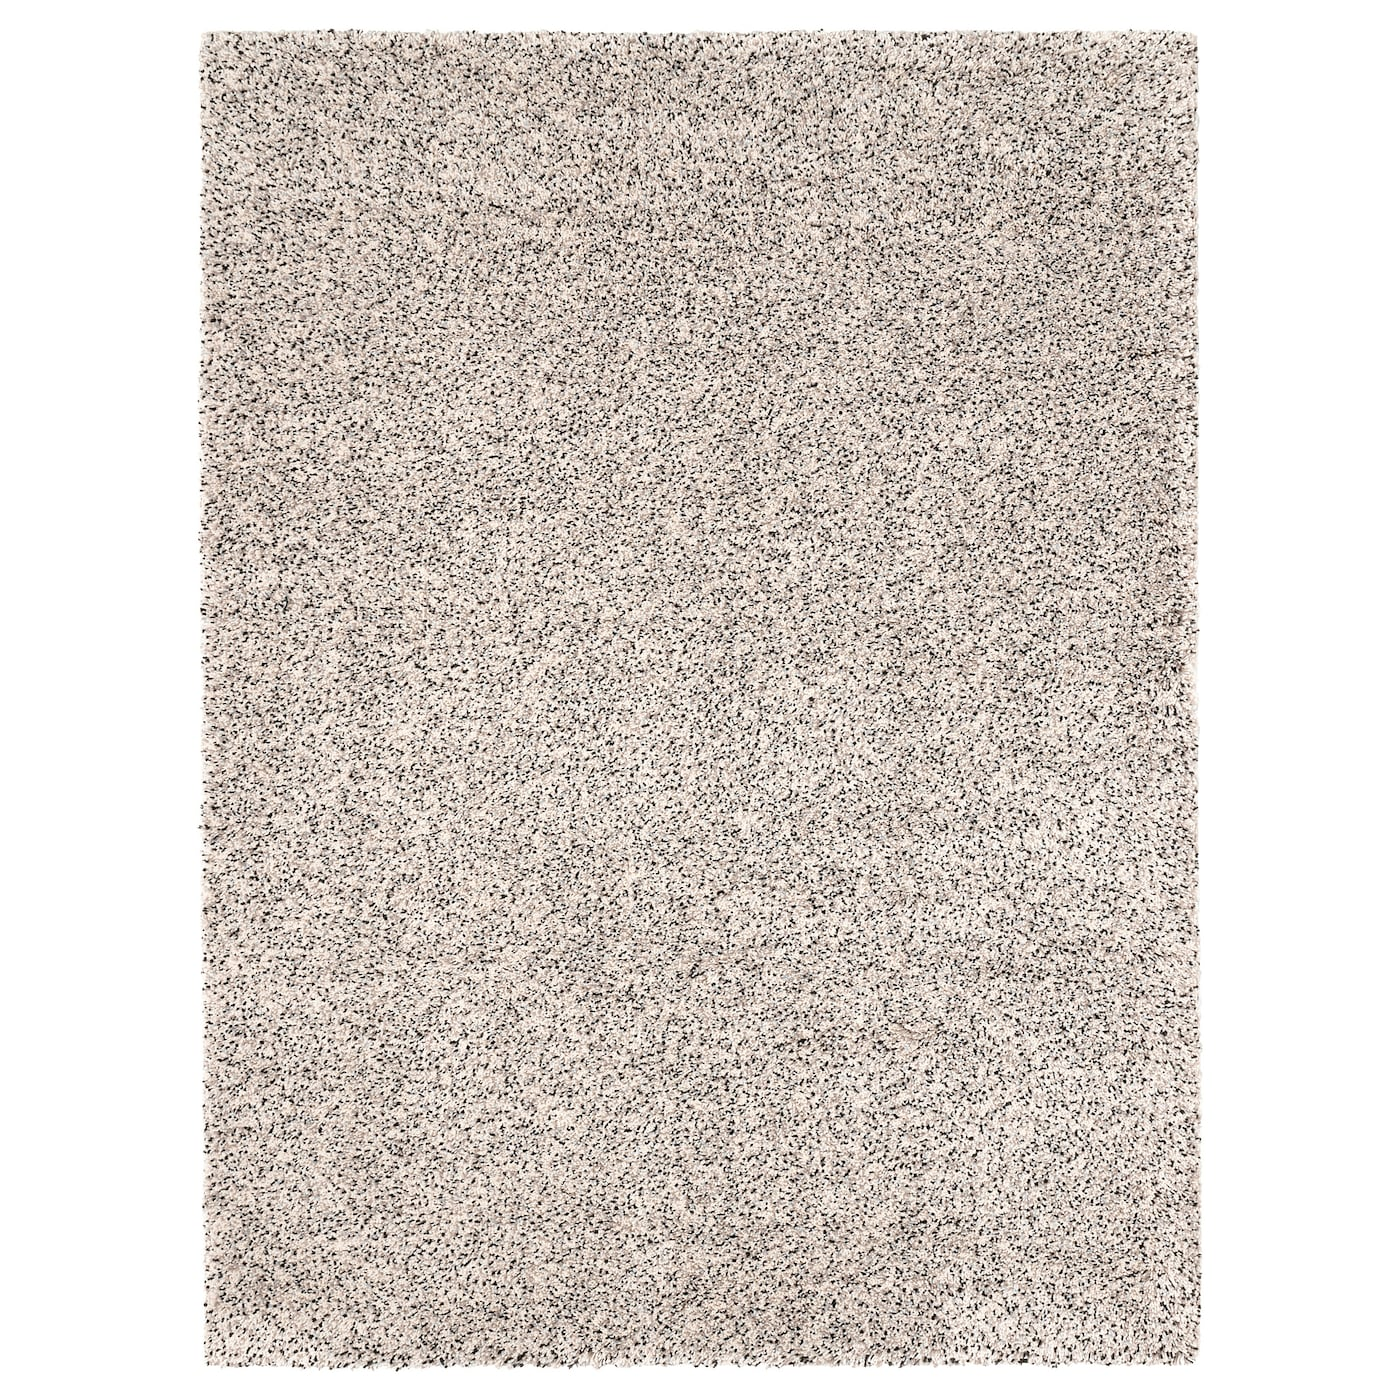 Vindum Rug High Pile White 200 X 270 Cm Ikea